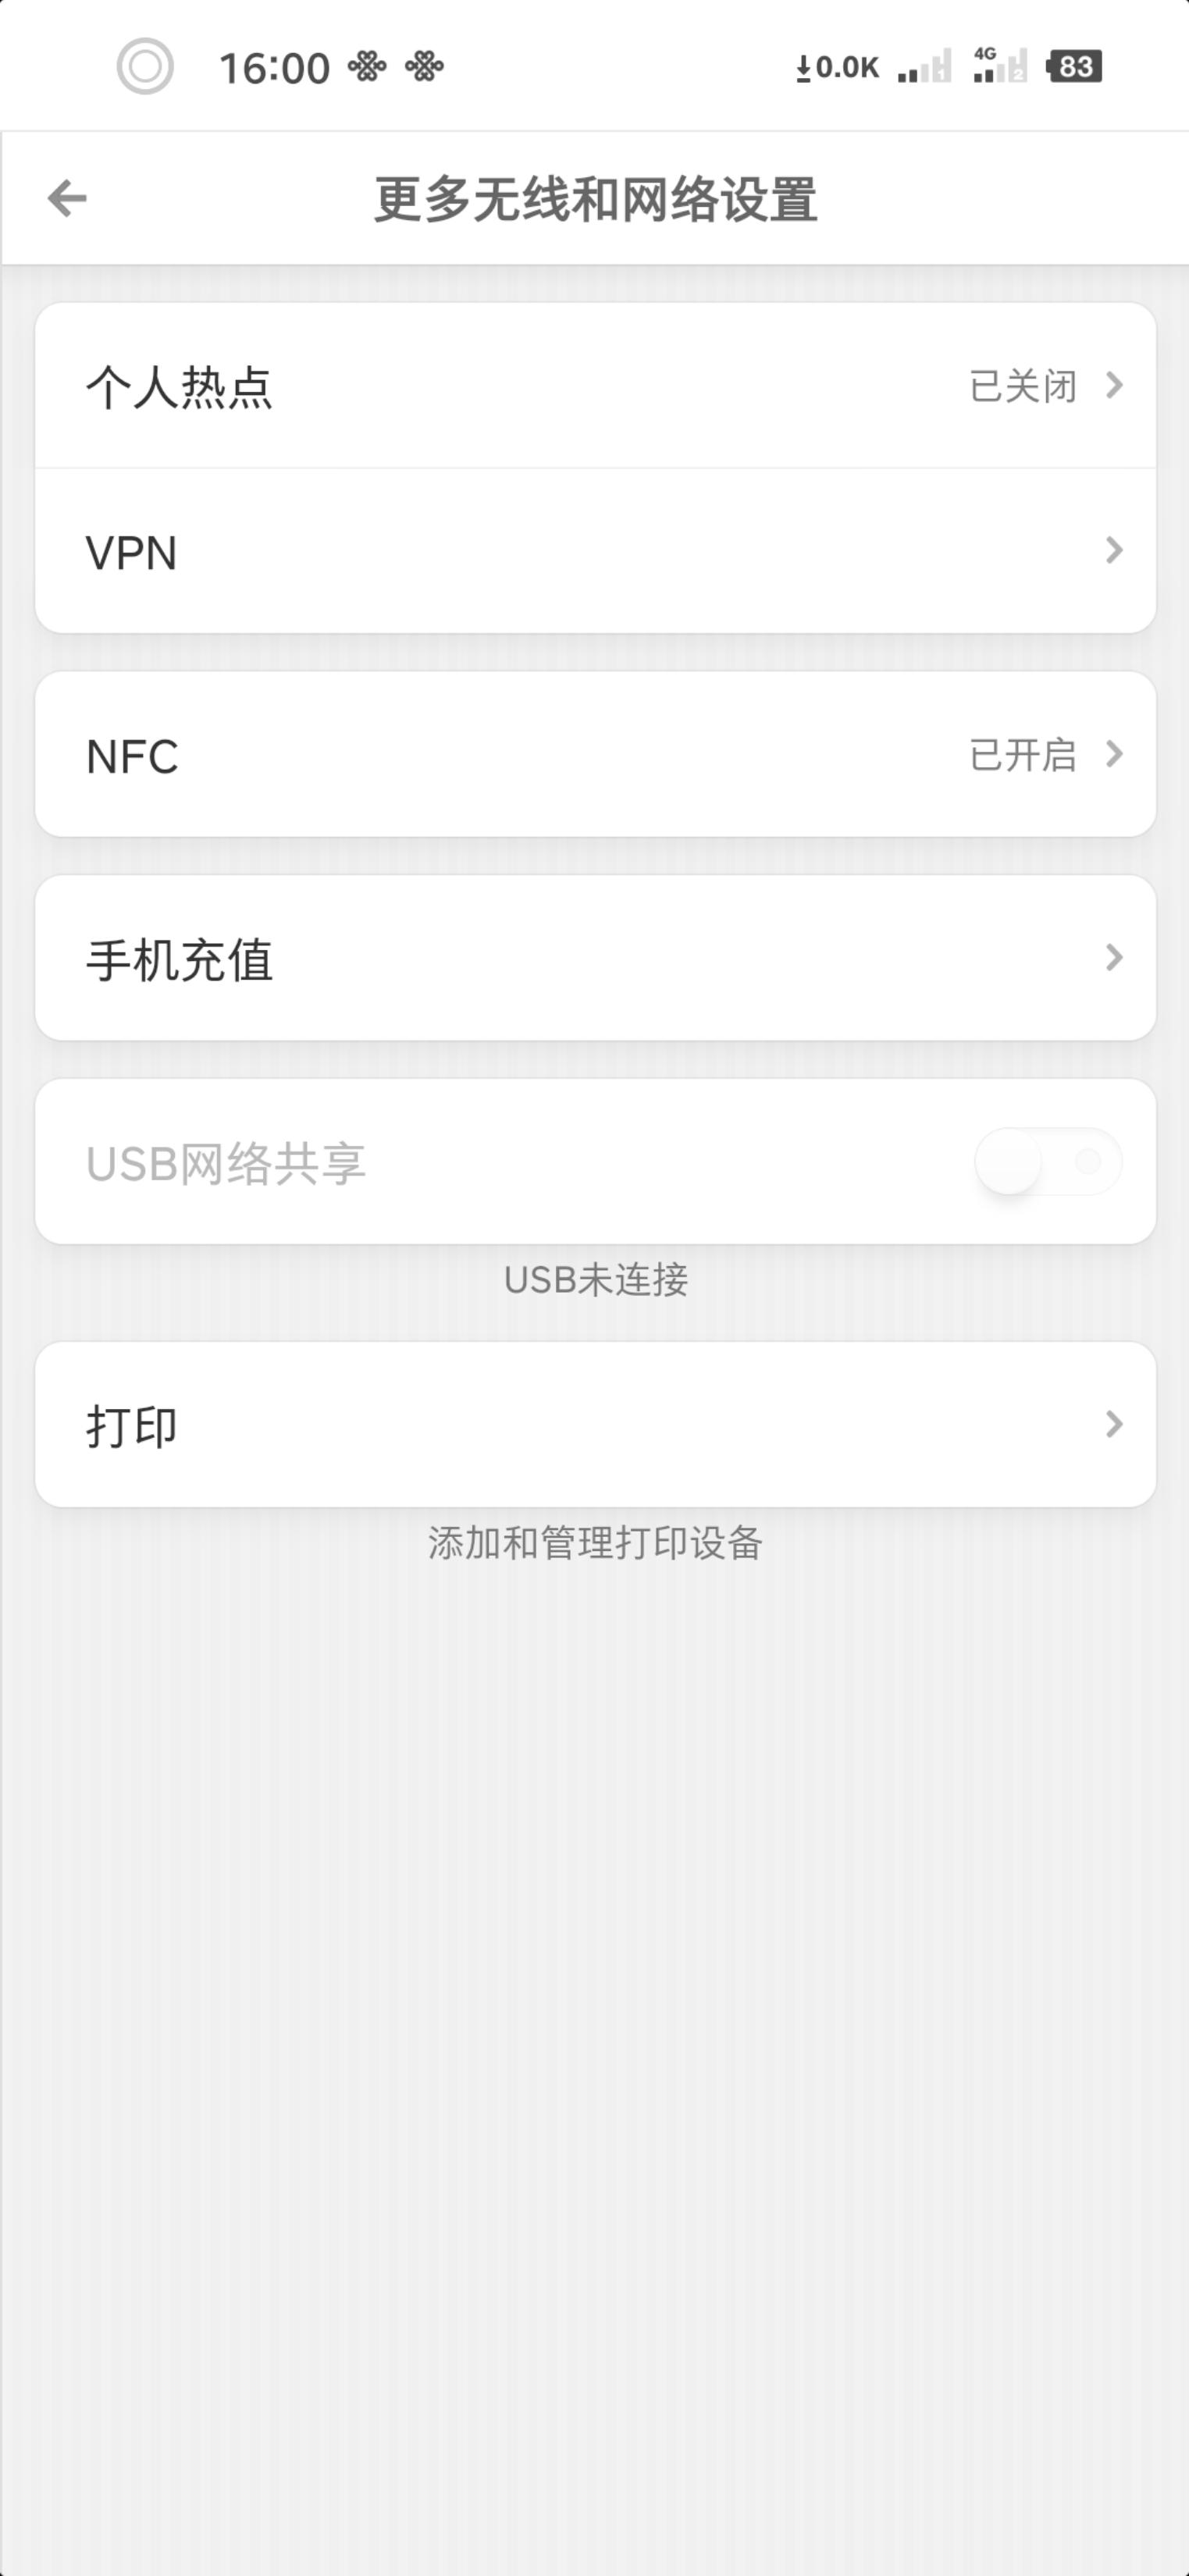 Screenshot_2021-02-25-16-00-10-105_??.png